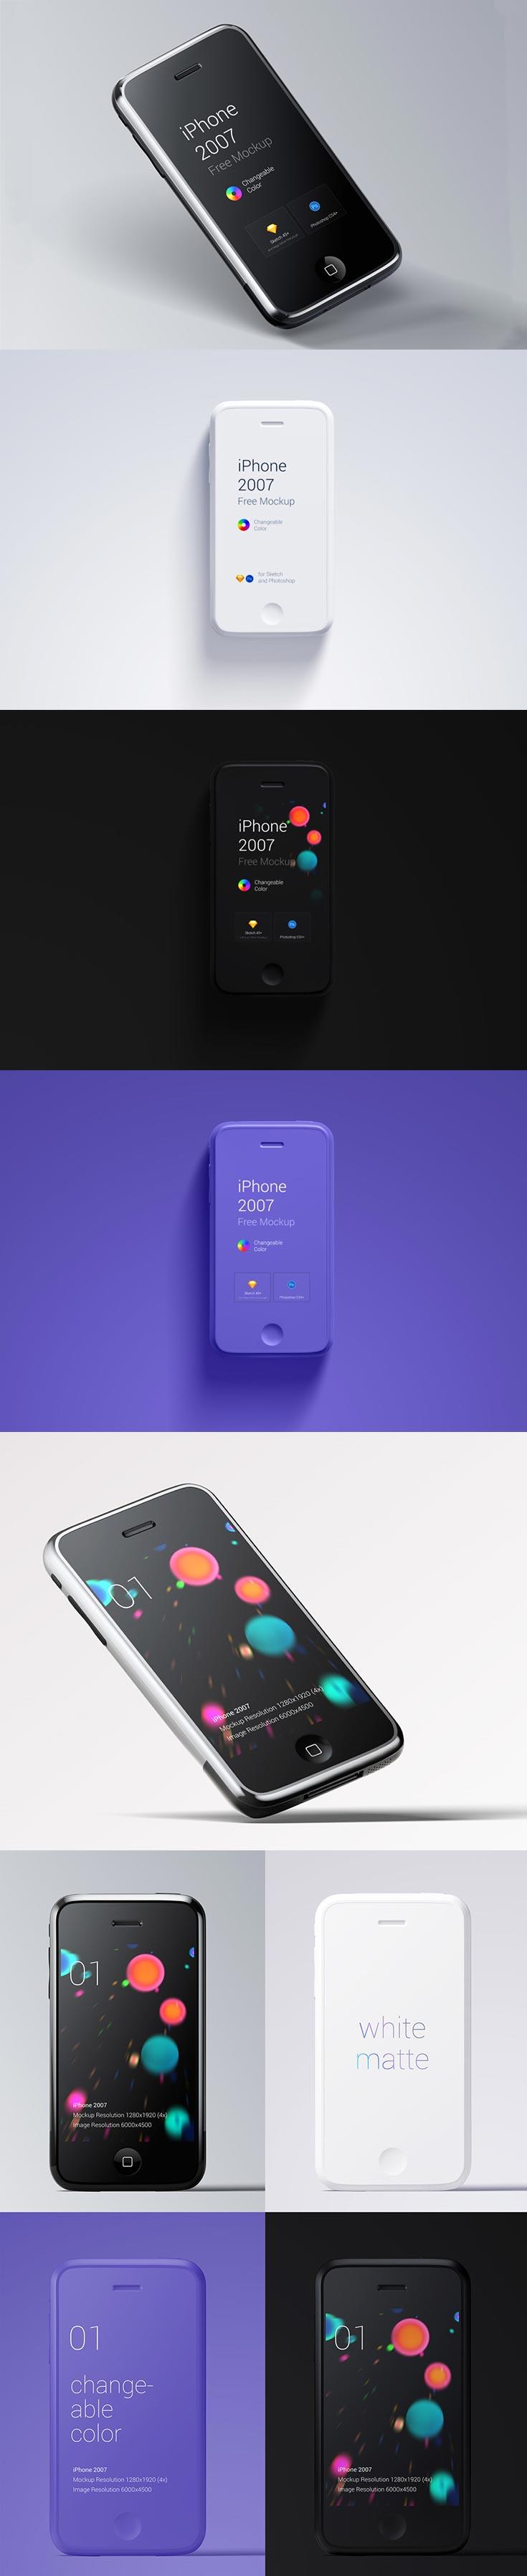 Free iPhone 1st Generation Mockup